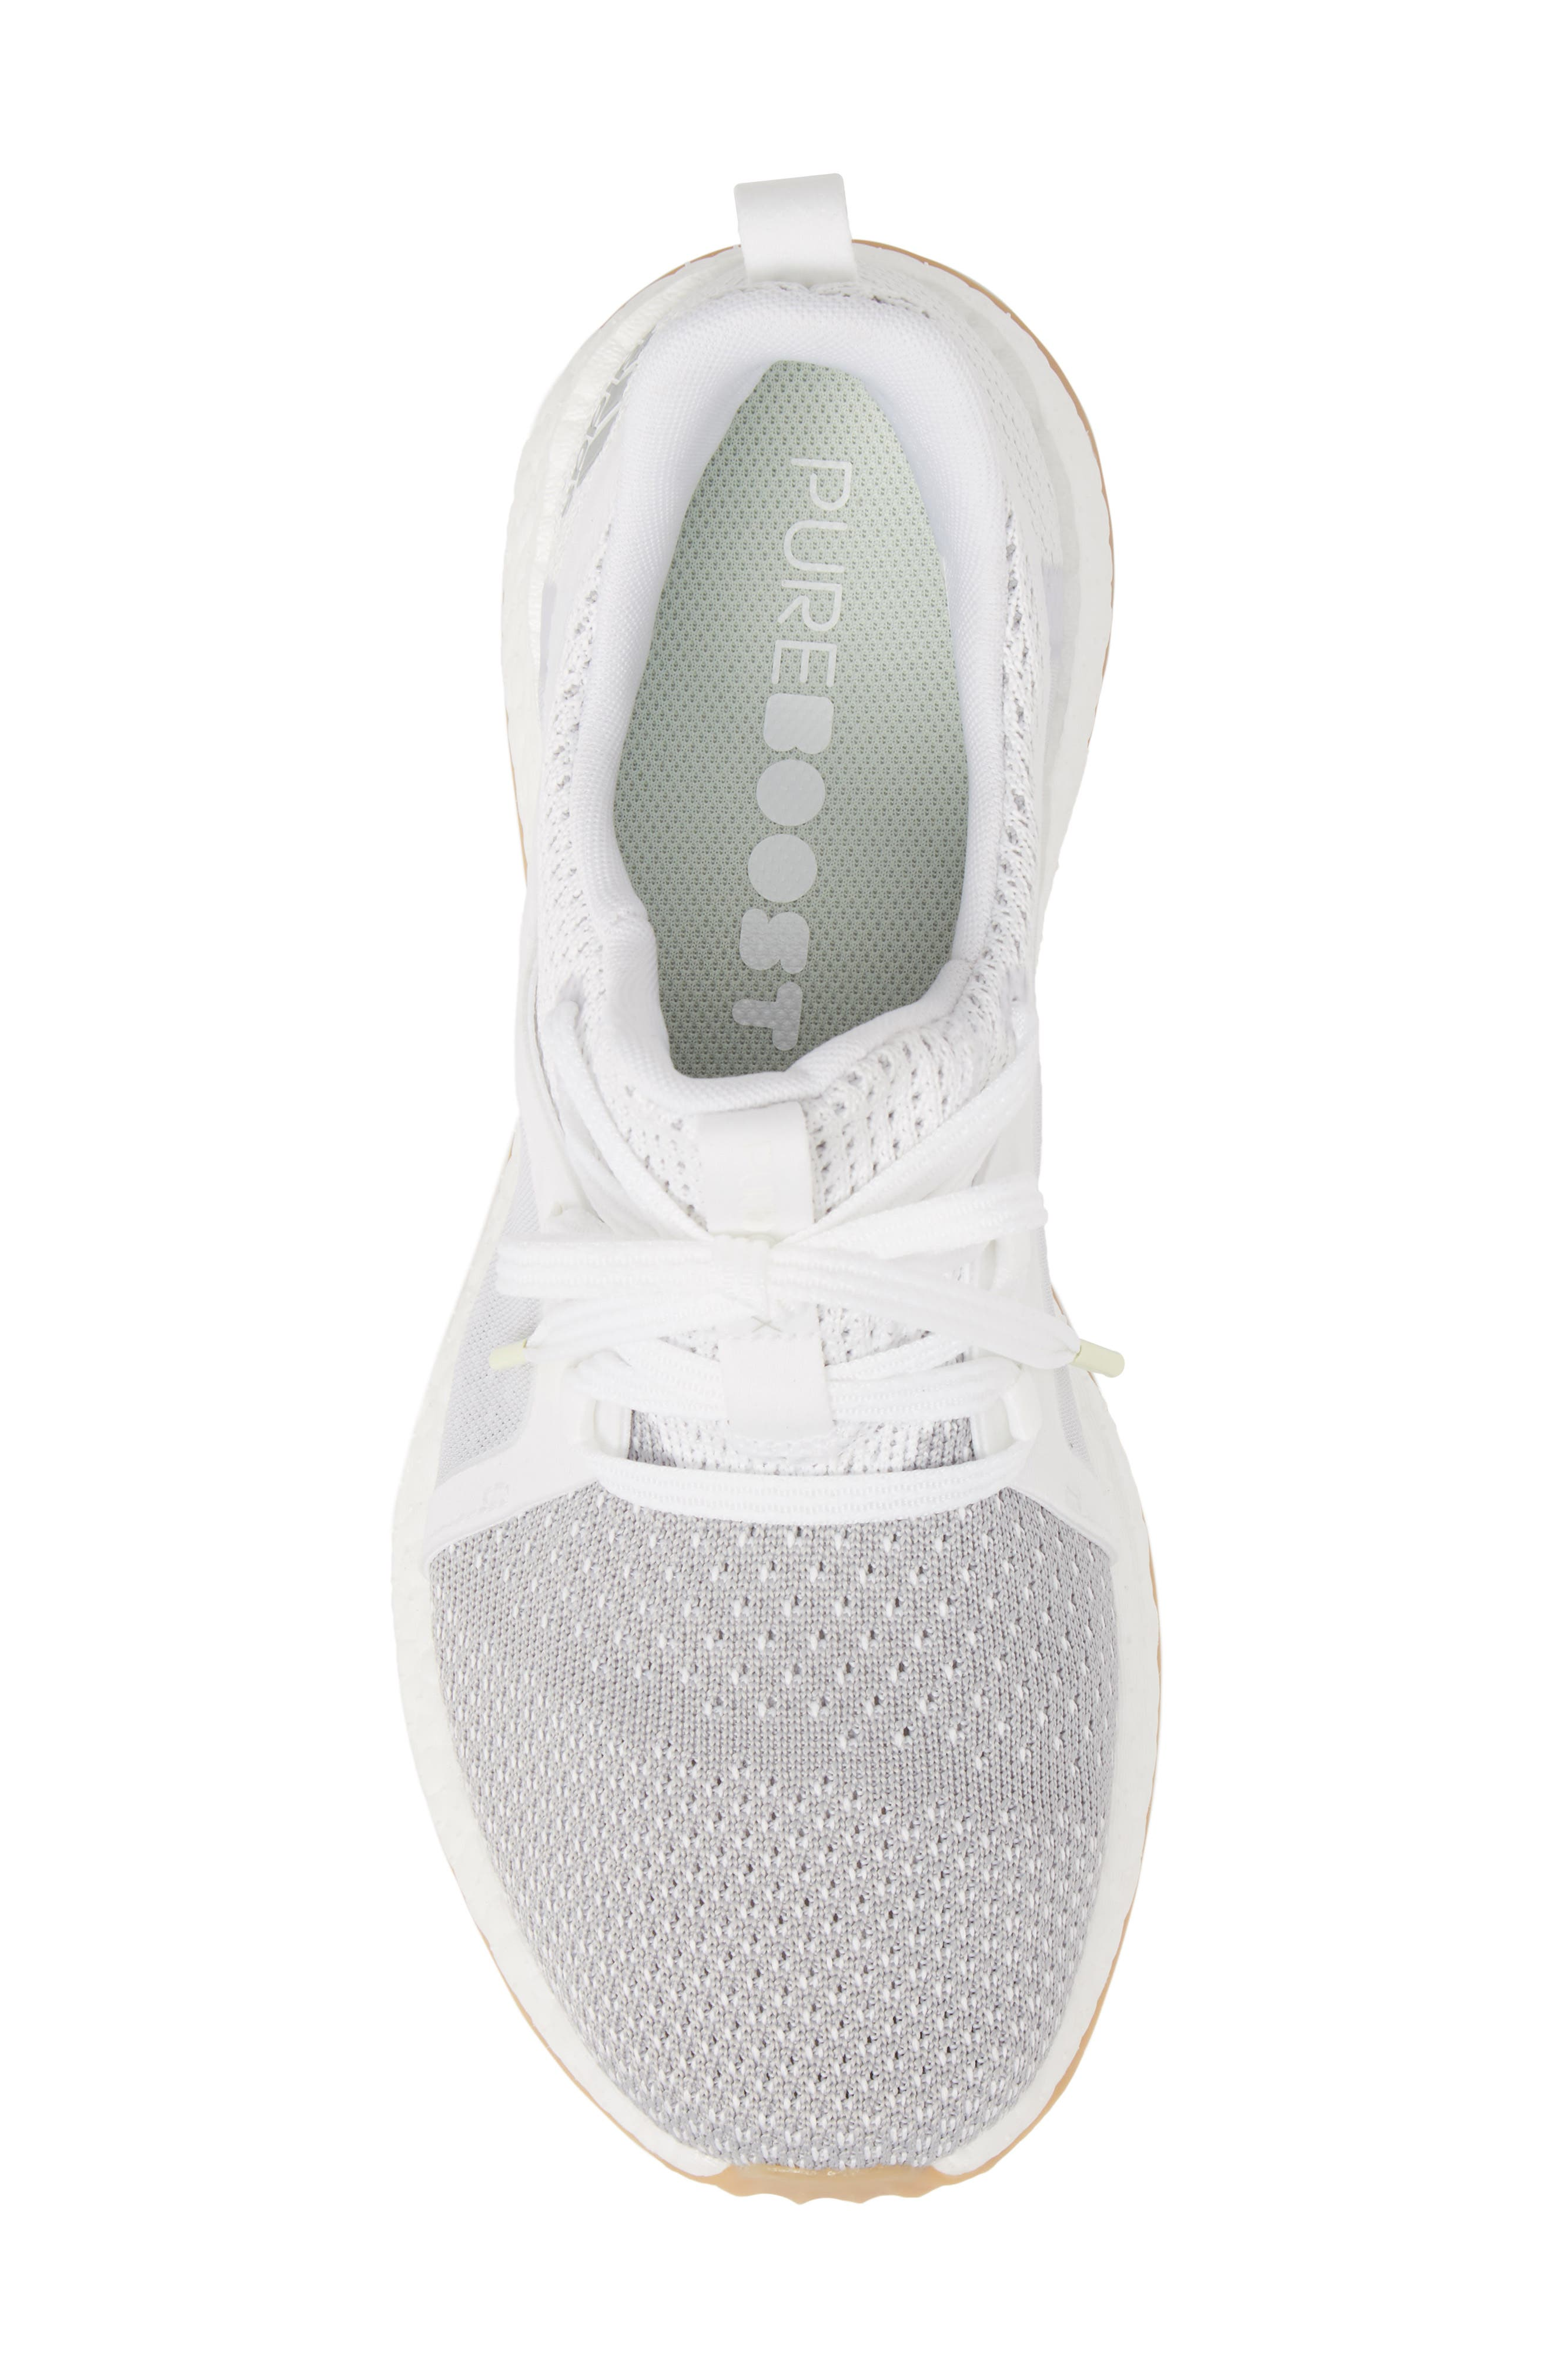 Pureboost X Clima Sneaker,                             Alternate thumbnail 5, color,                             White/ Silver/ Grey